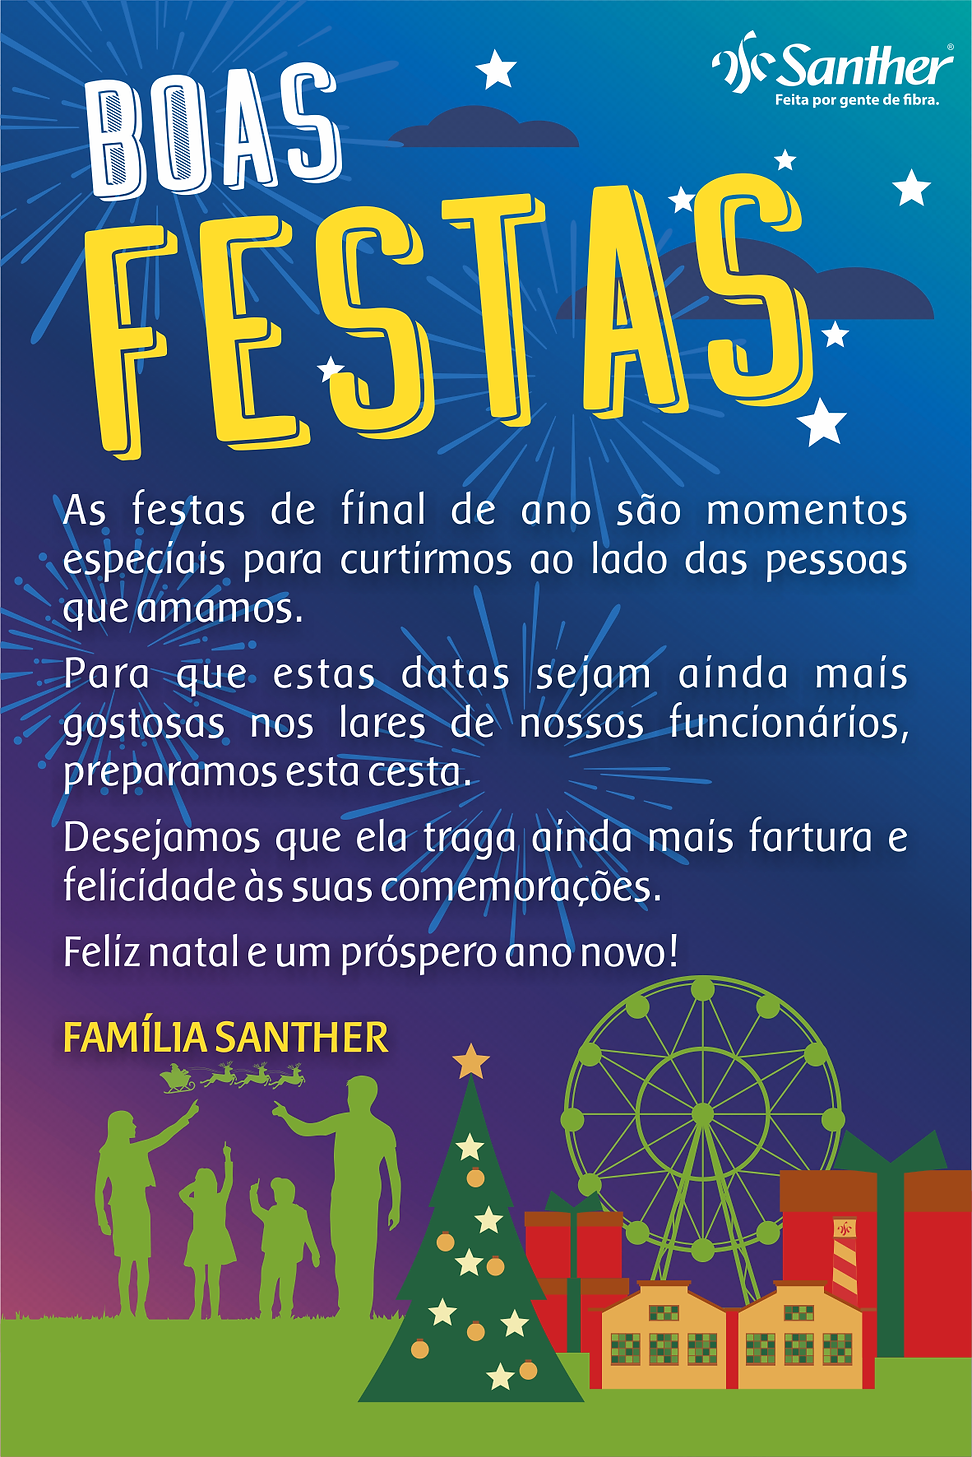 Santher_-_Cartão_Virtual_Cesta_Básica.pn